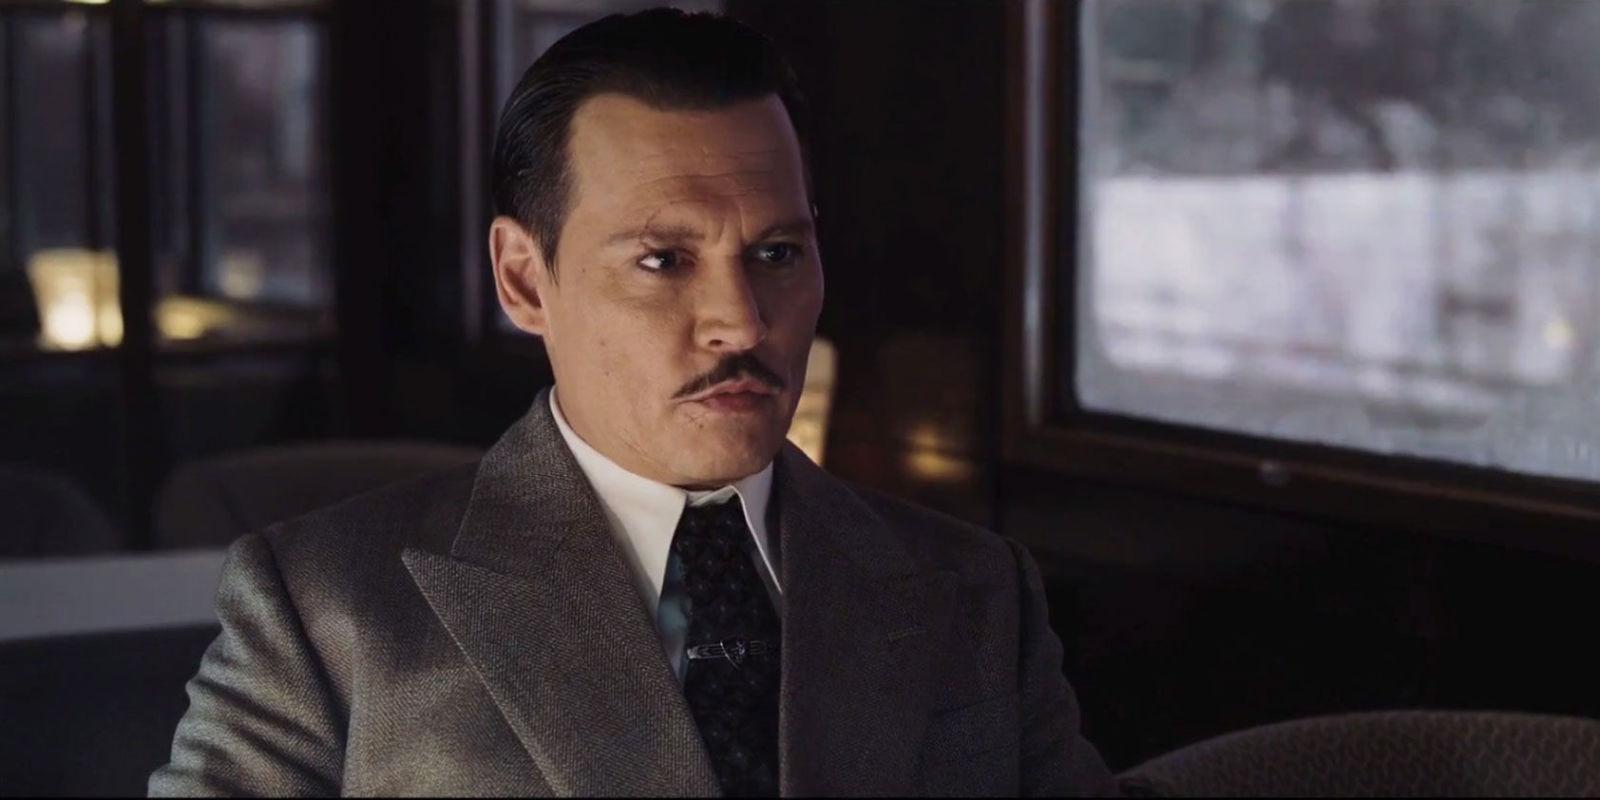 Johnny Depp Murder on the Orient Express